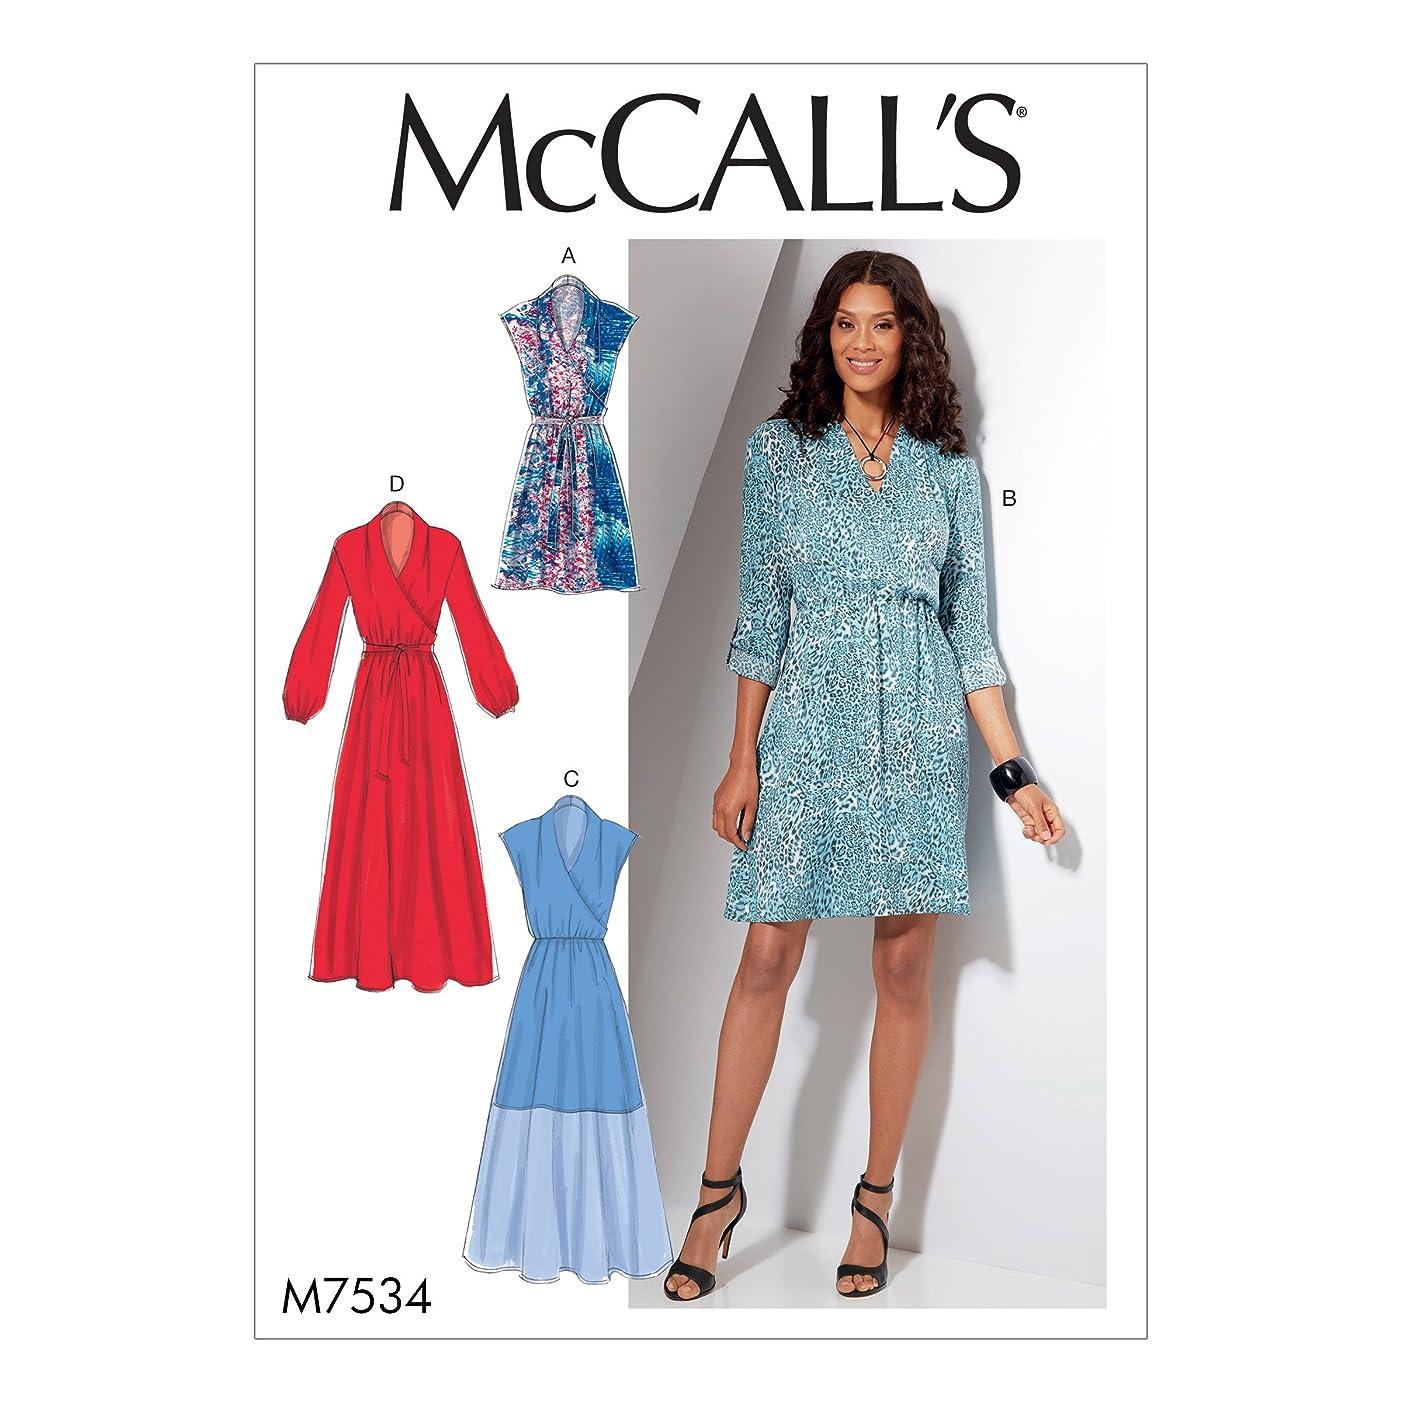 MCCALLS M7534 Misses' Mock-Wrap Dresses (SIZE 6-24) SEWING PATTERN